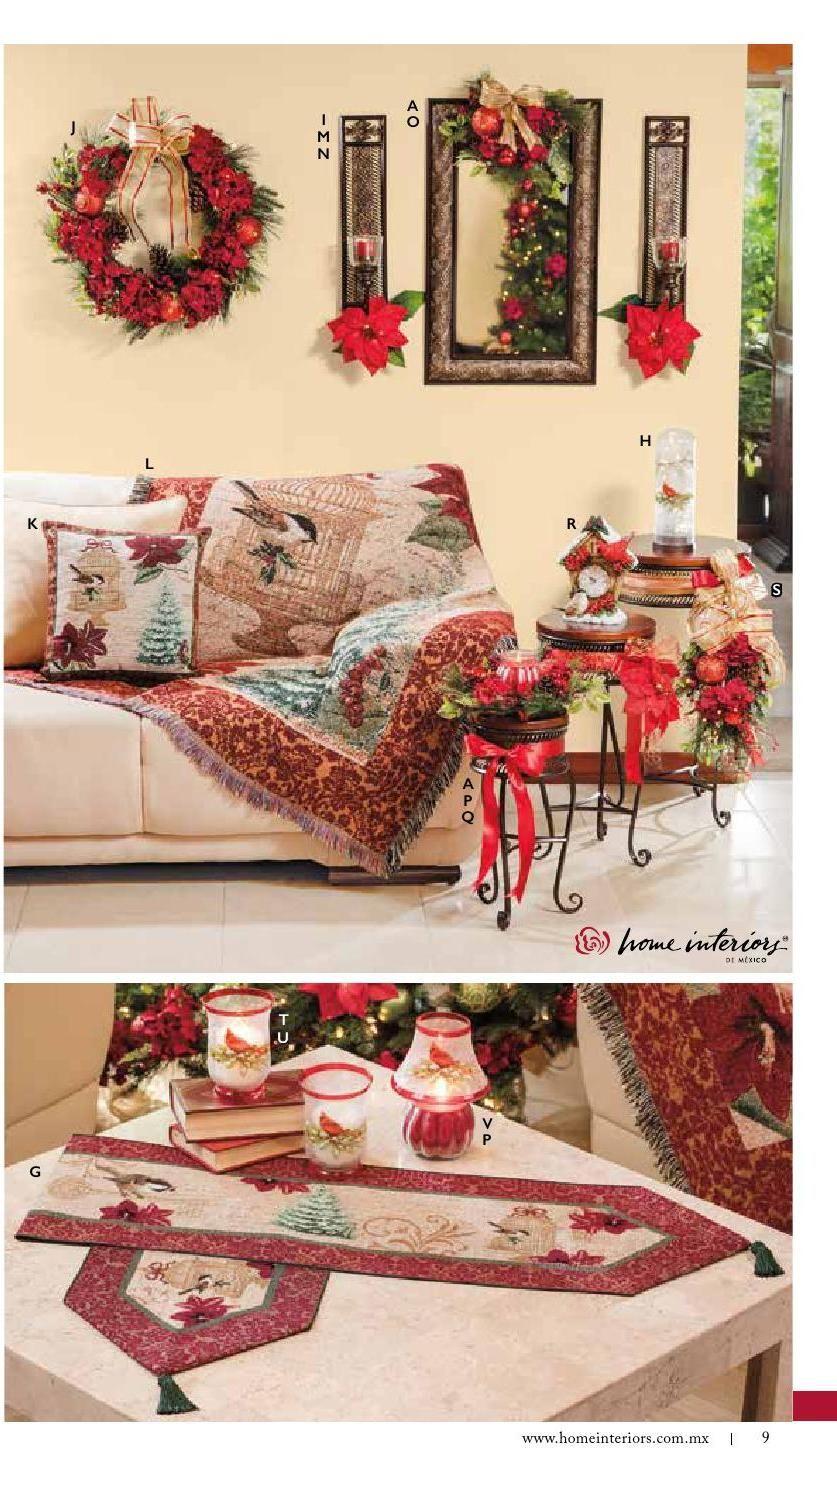 Home Interiors Catalogo Navidad 2016 House Interior Interior Navidad